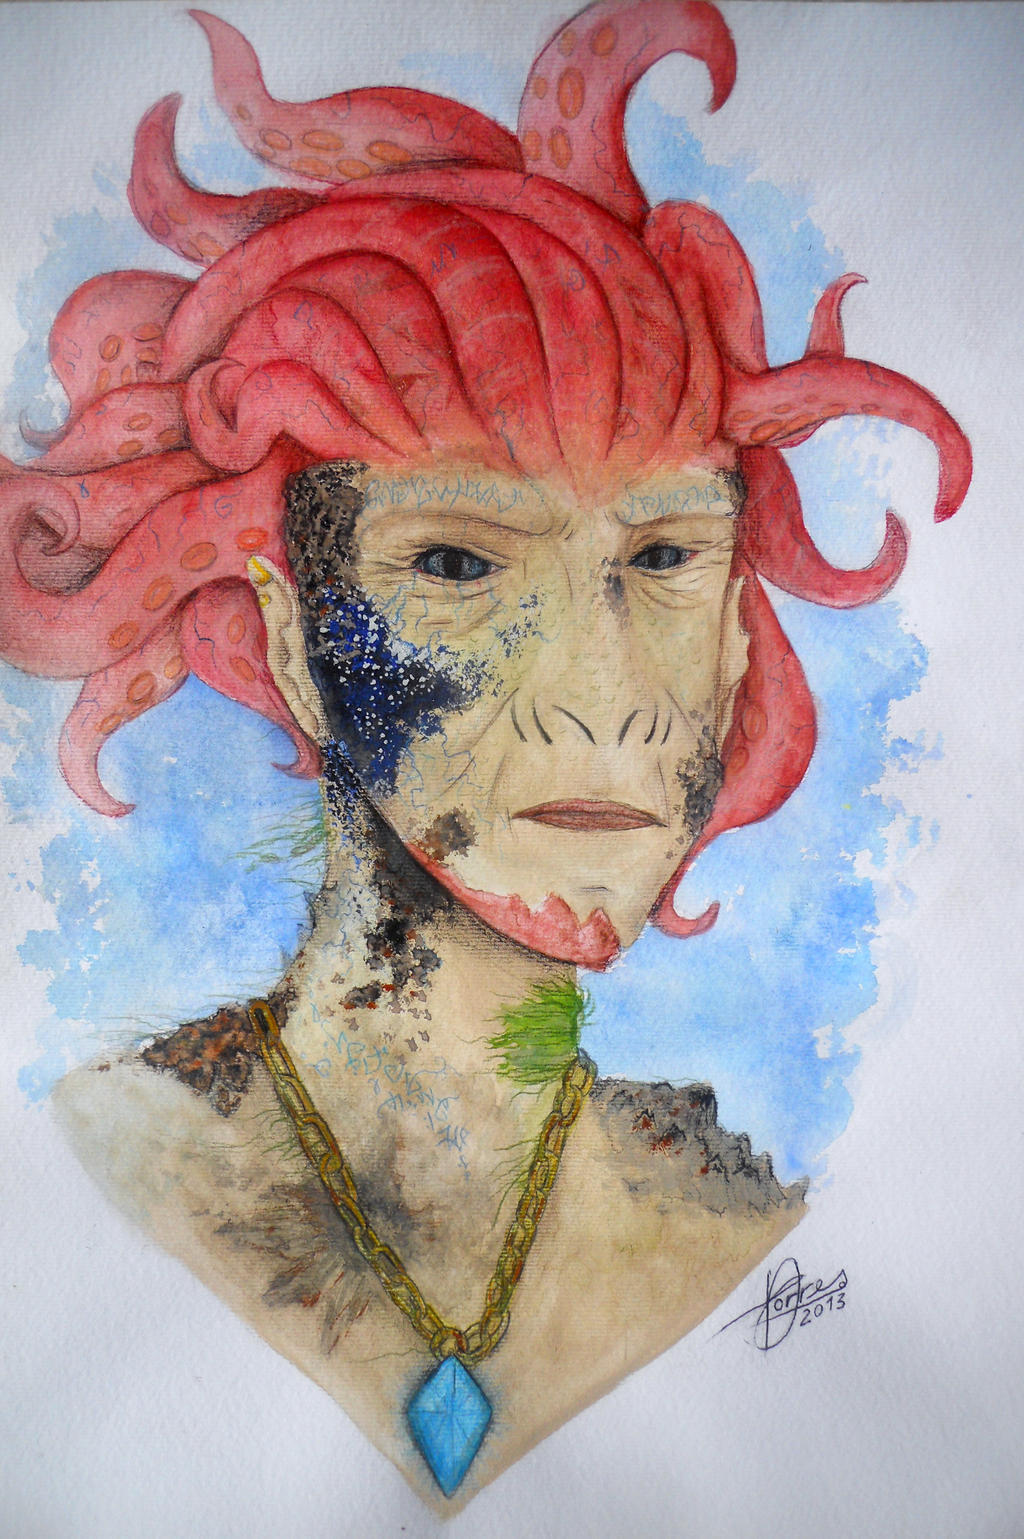 Okyanus Kralice - Queen of the Ocean by diegio1996